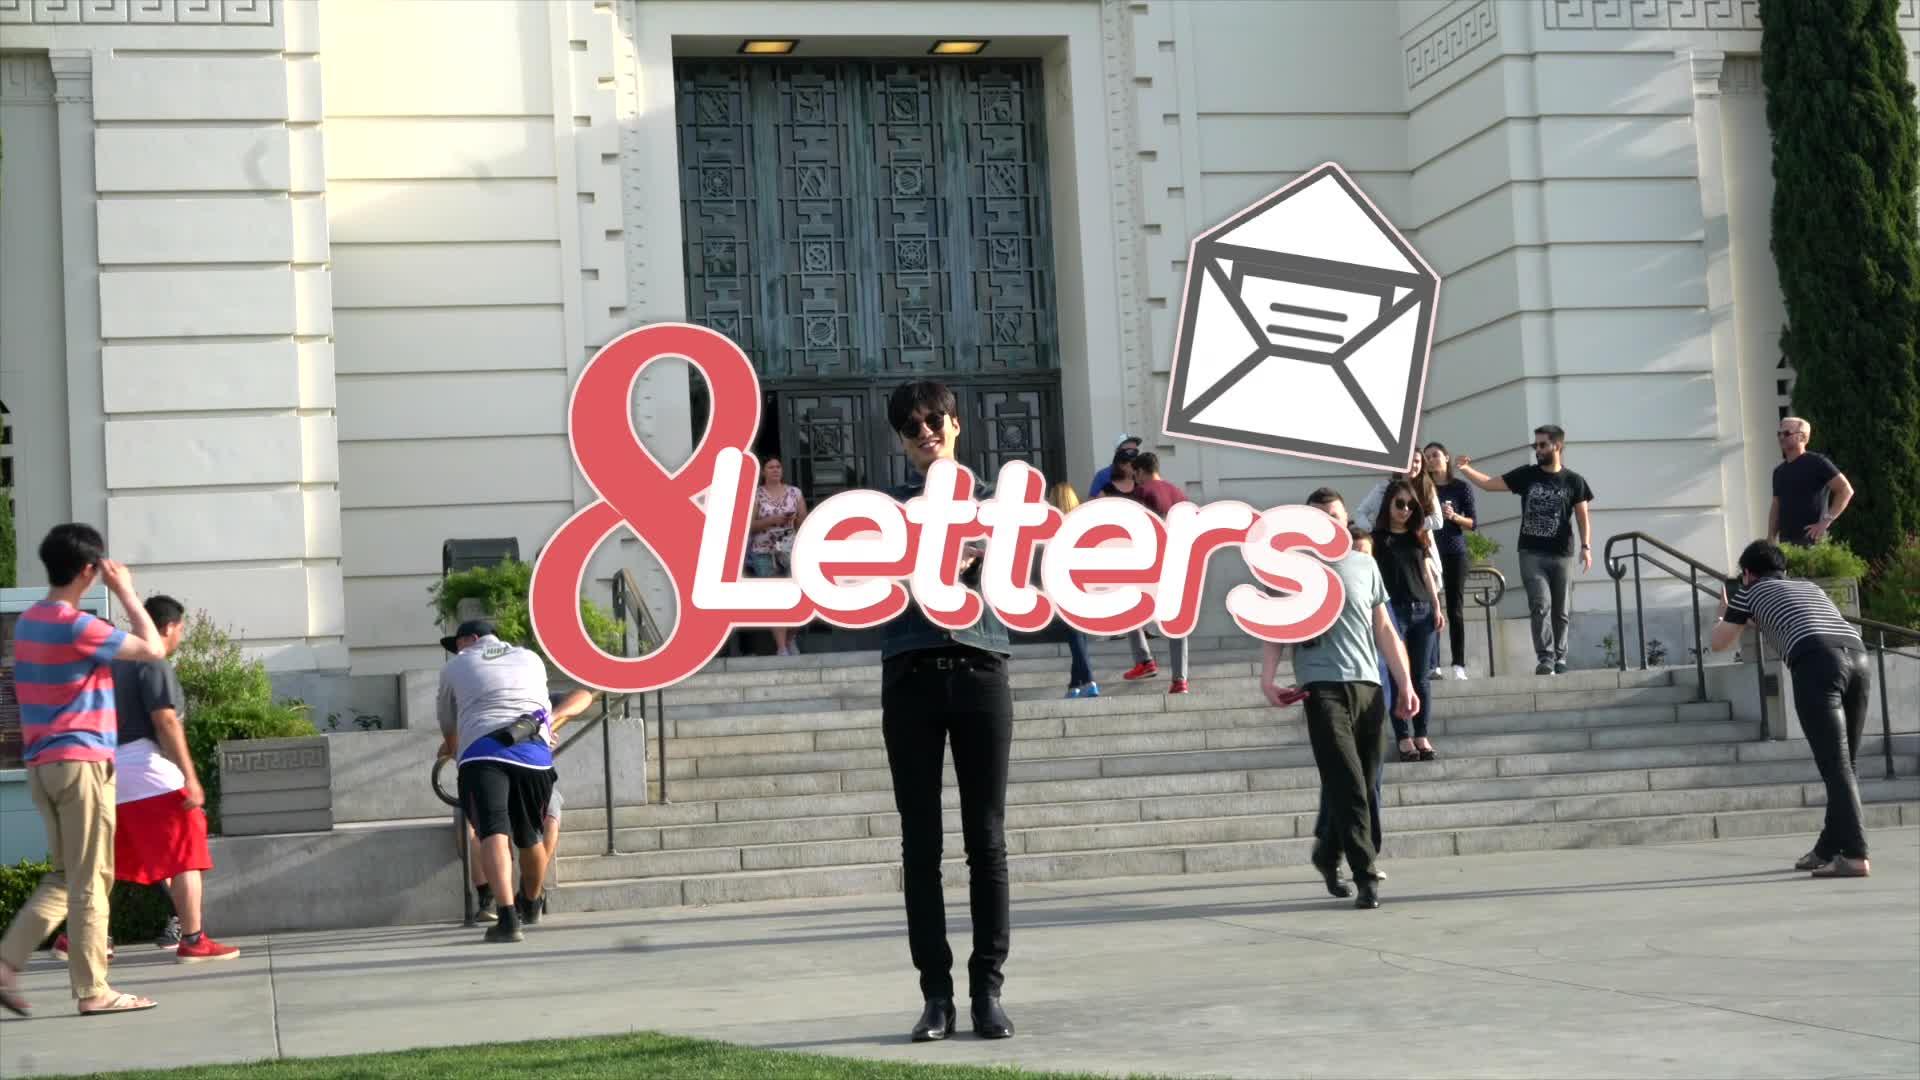 [LEEE MIN HO] 8 Letters #Teaser. 2